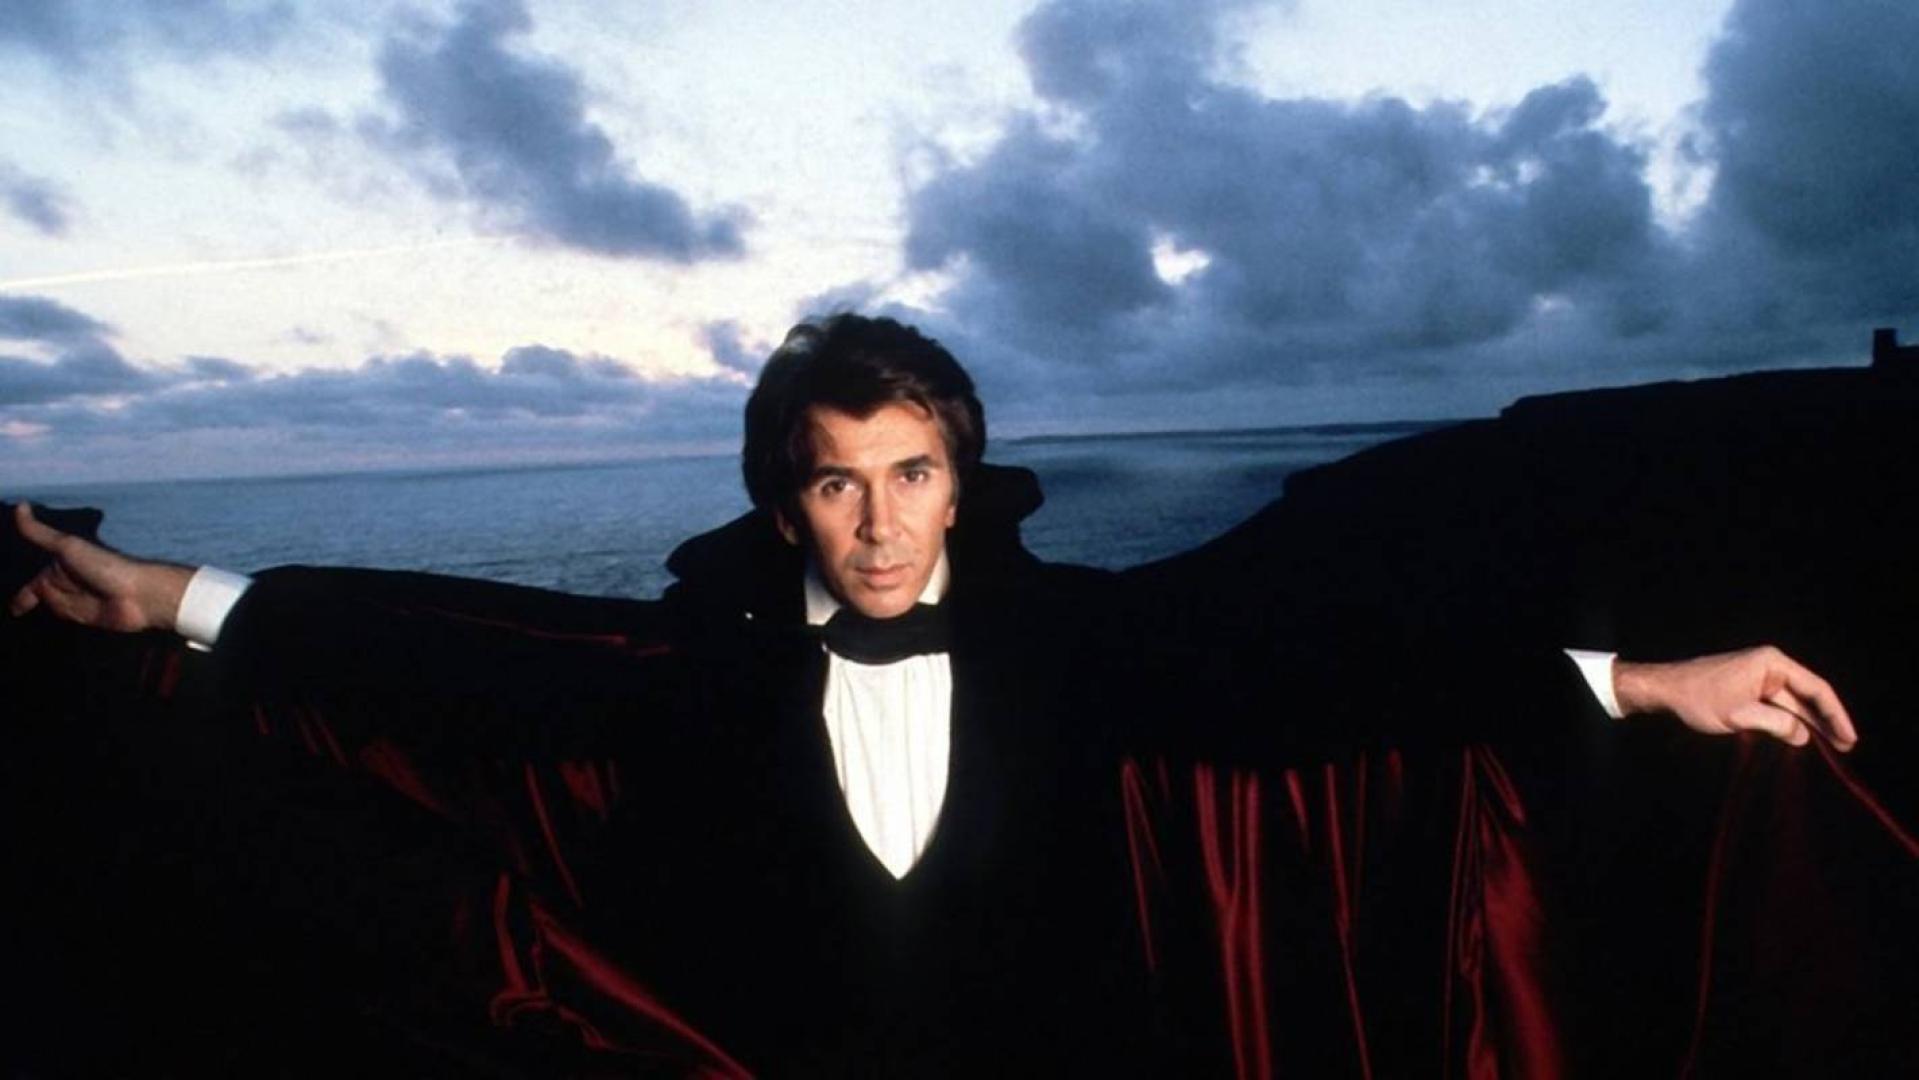 Dracula - Drakula (1979)